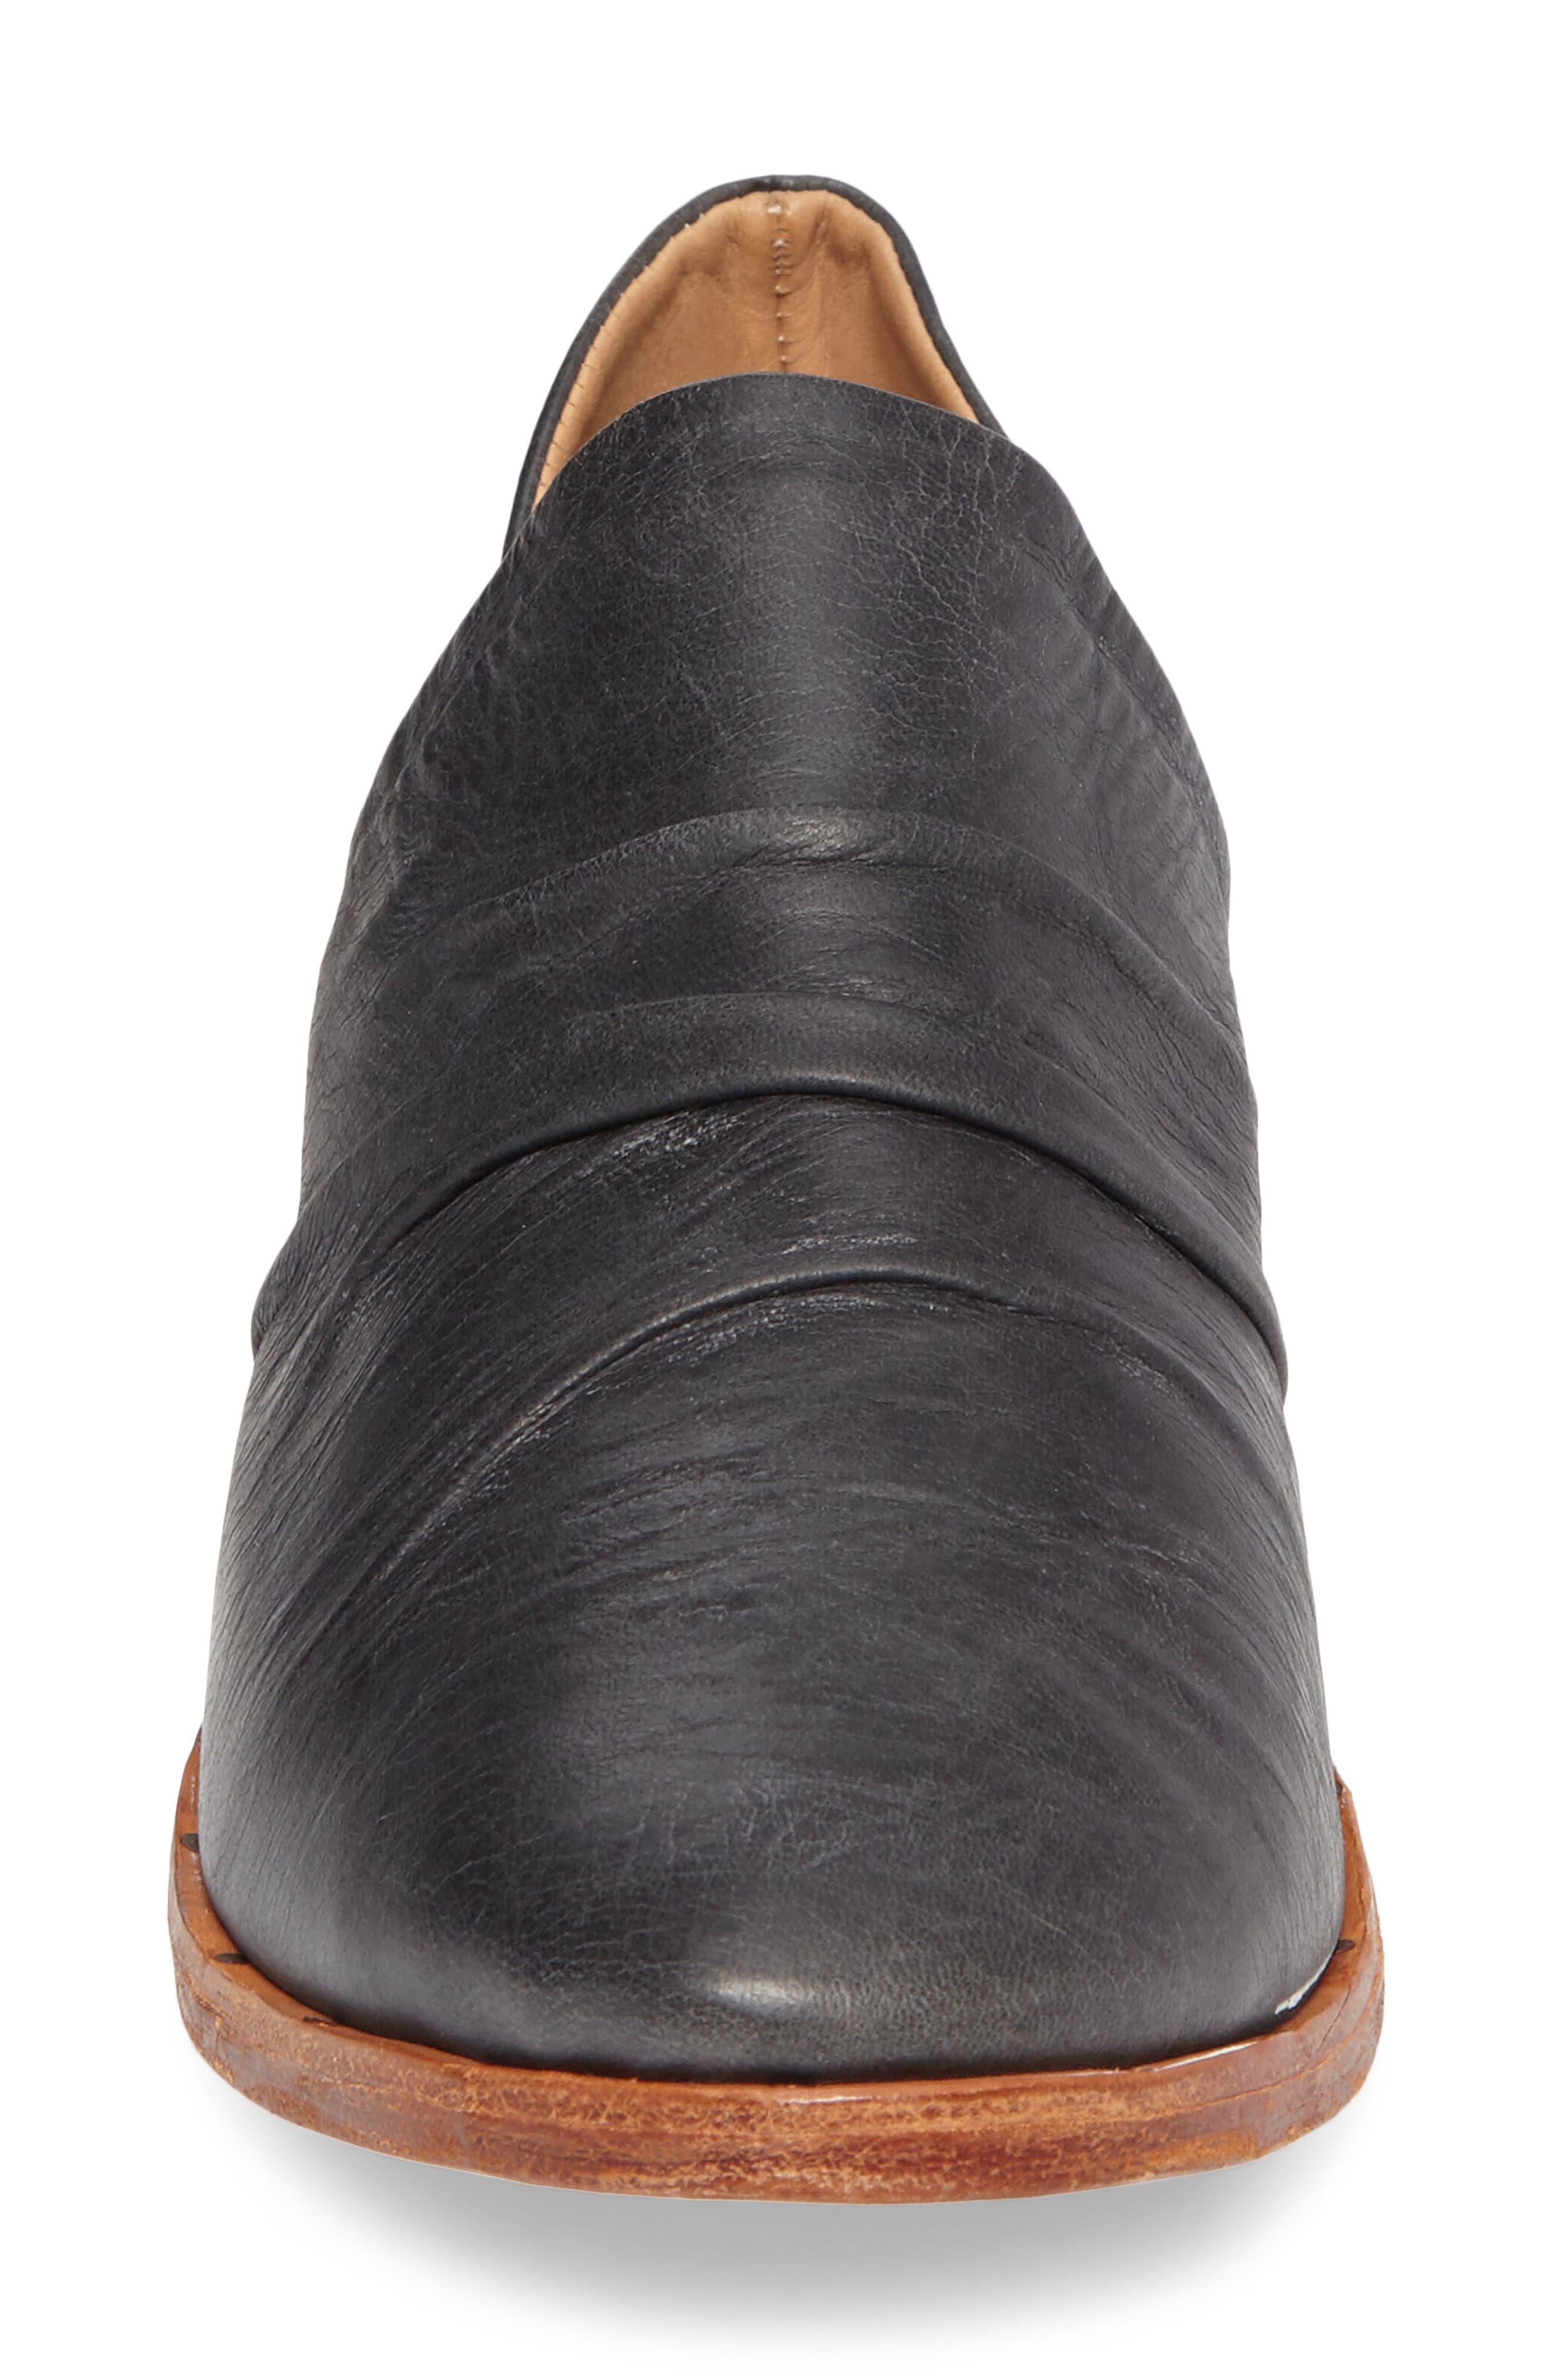 Puffin Loafer,                             Alternate thumbnail 4, color,                             Vintage Black